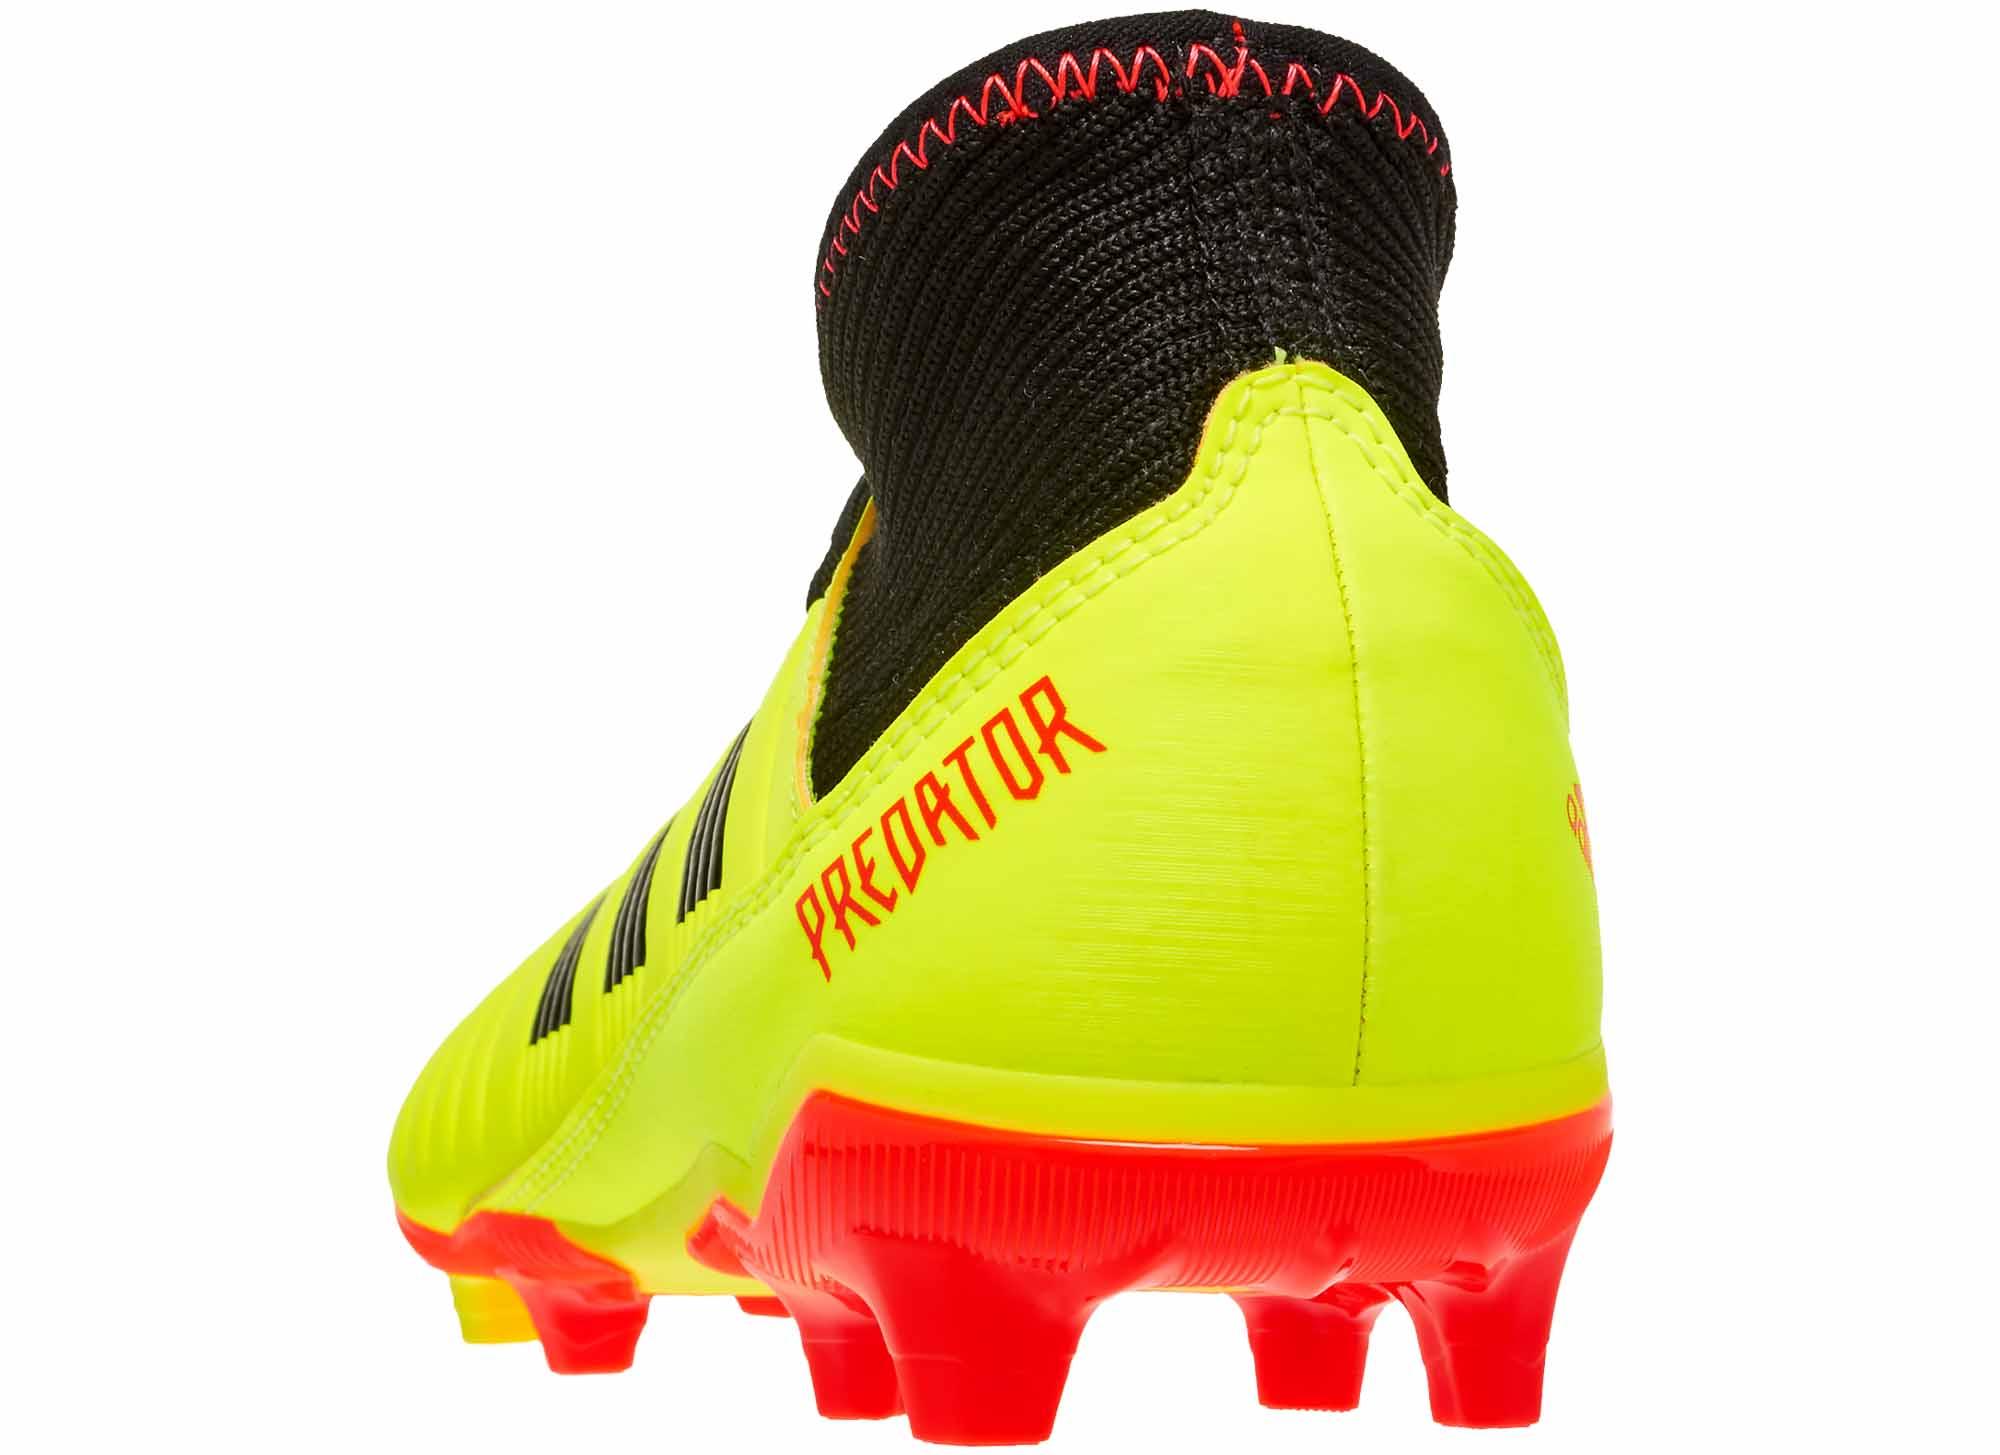 3d8344d37 adidas Predator 18.3 FG - Youth - Solar Yellow Black Solar Red ...